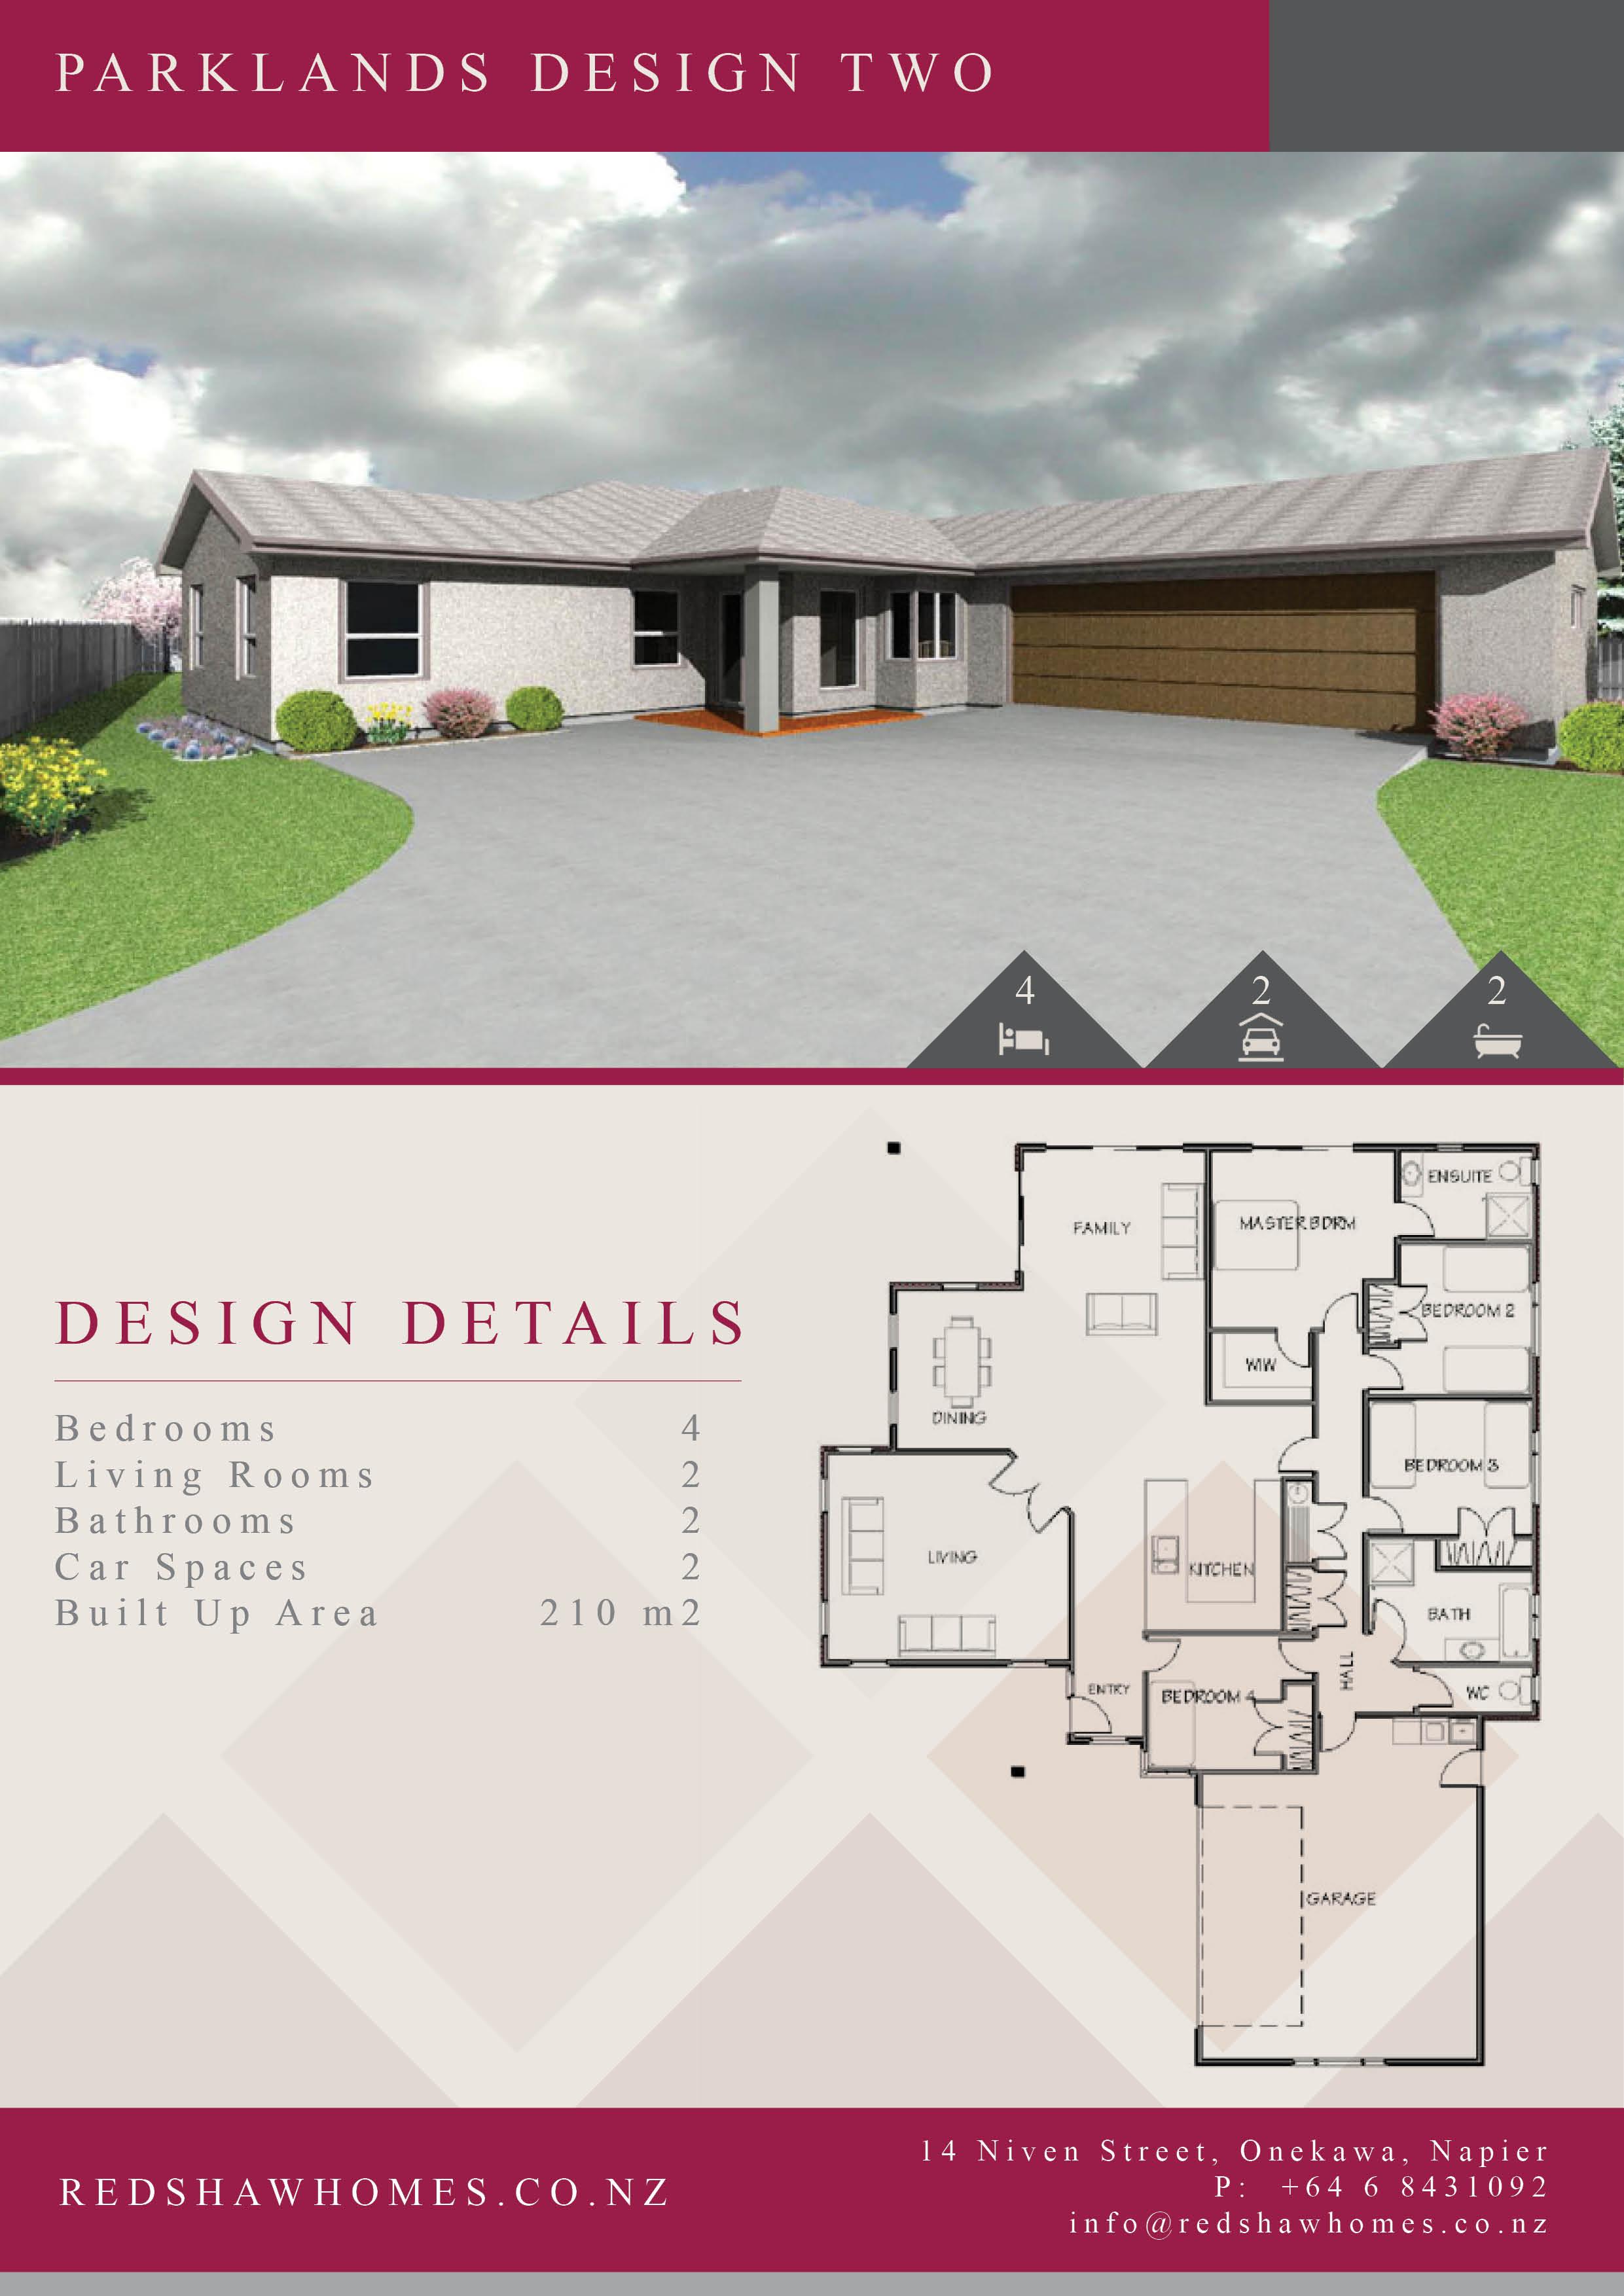 Home Designs - Redshaw Homes